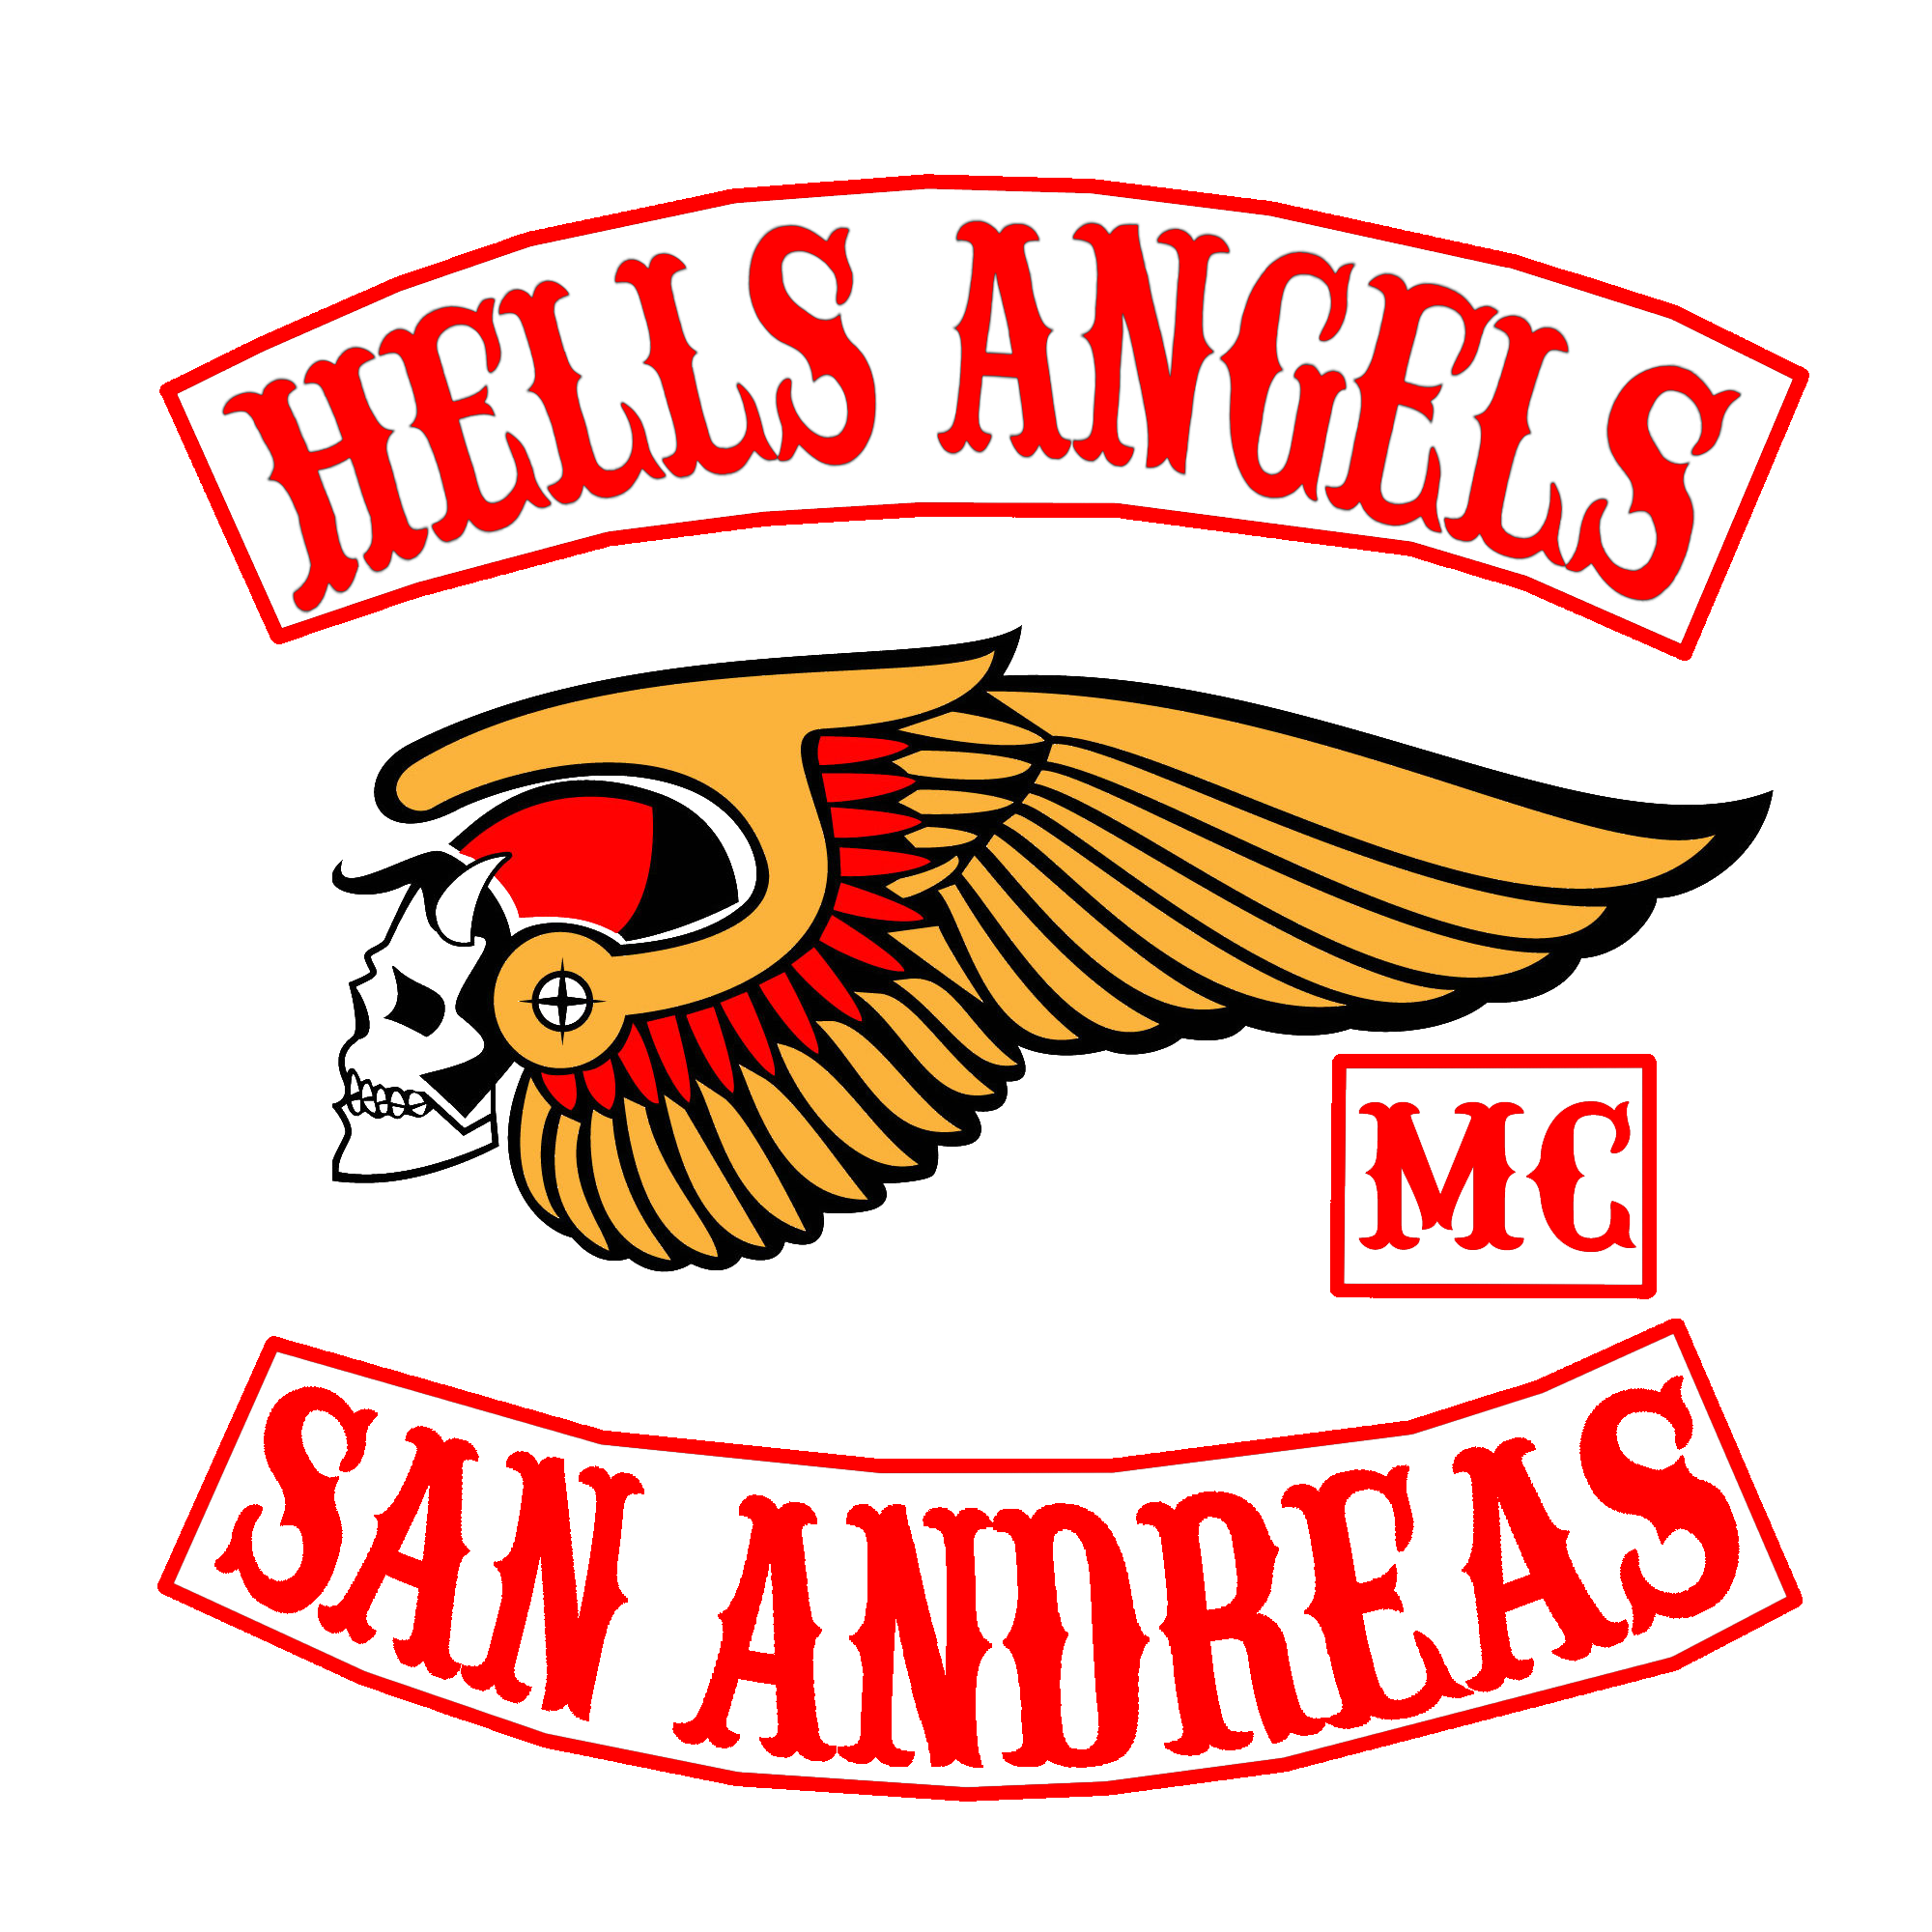 hells angels patches hells angels mc biker patches. Black Bedroom Furniture Sets. Home Design Ideas